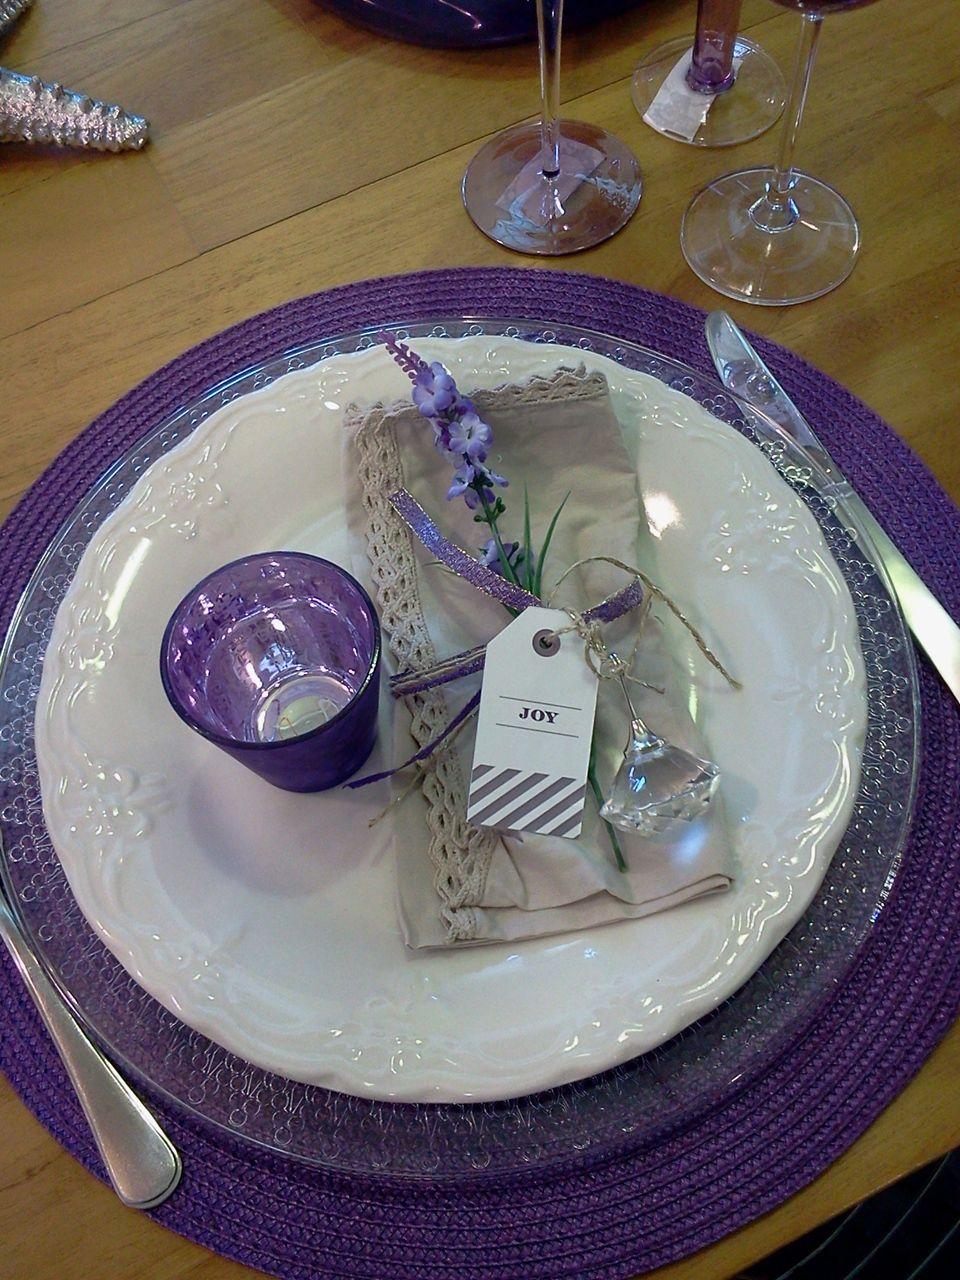 Xmas Table Purple White Christmas Table Setting Christmas Xmas Purple Xmas Purple Christmas Christmas Table Settings Christmas Tablescapes